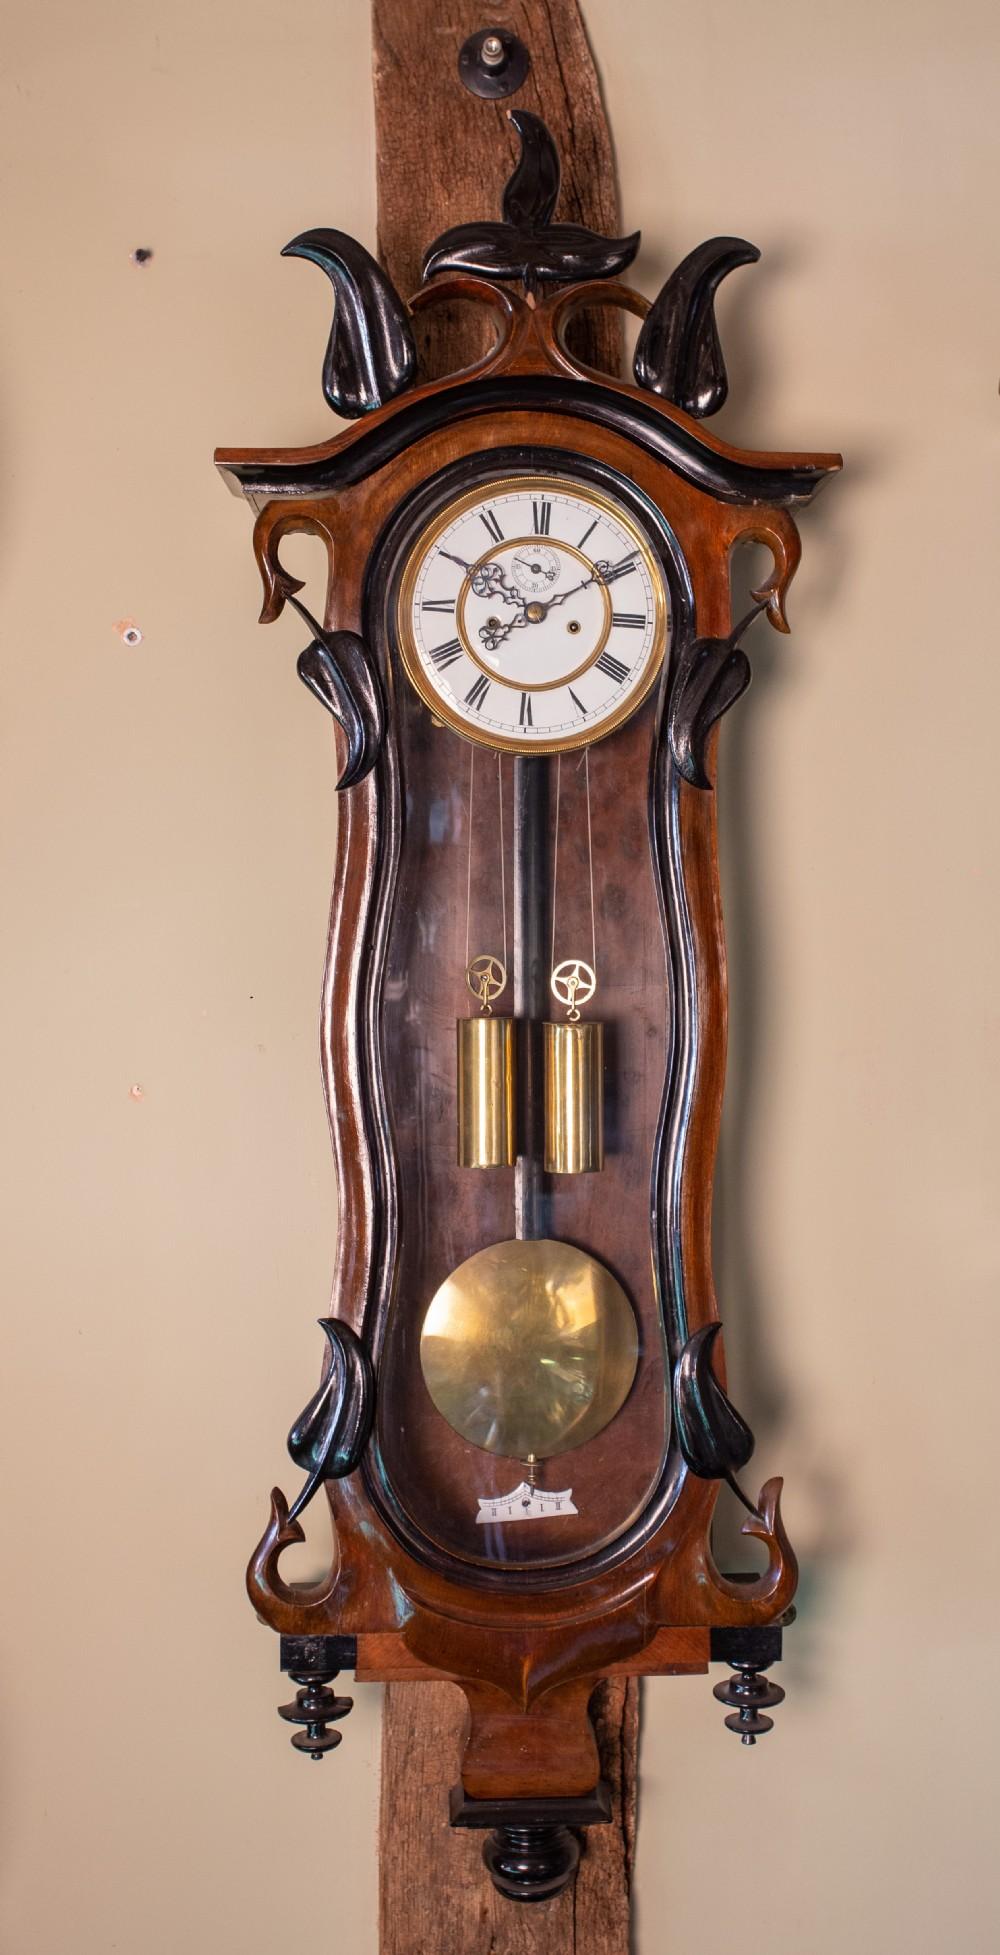 elegant slim vienna regulator in a very organic walnut case in art nouveau style